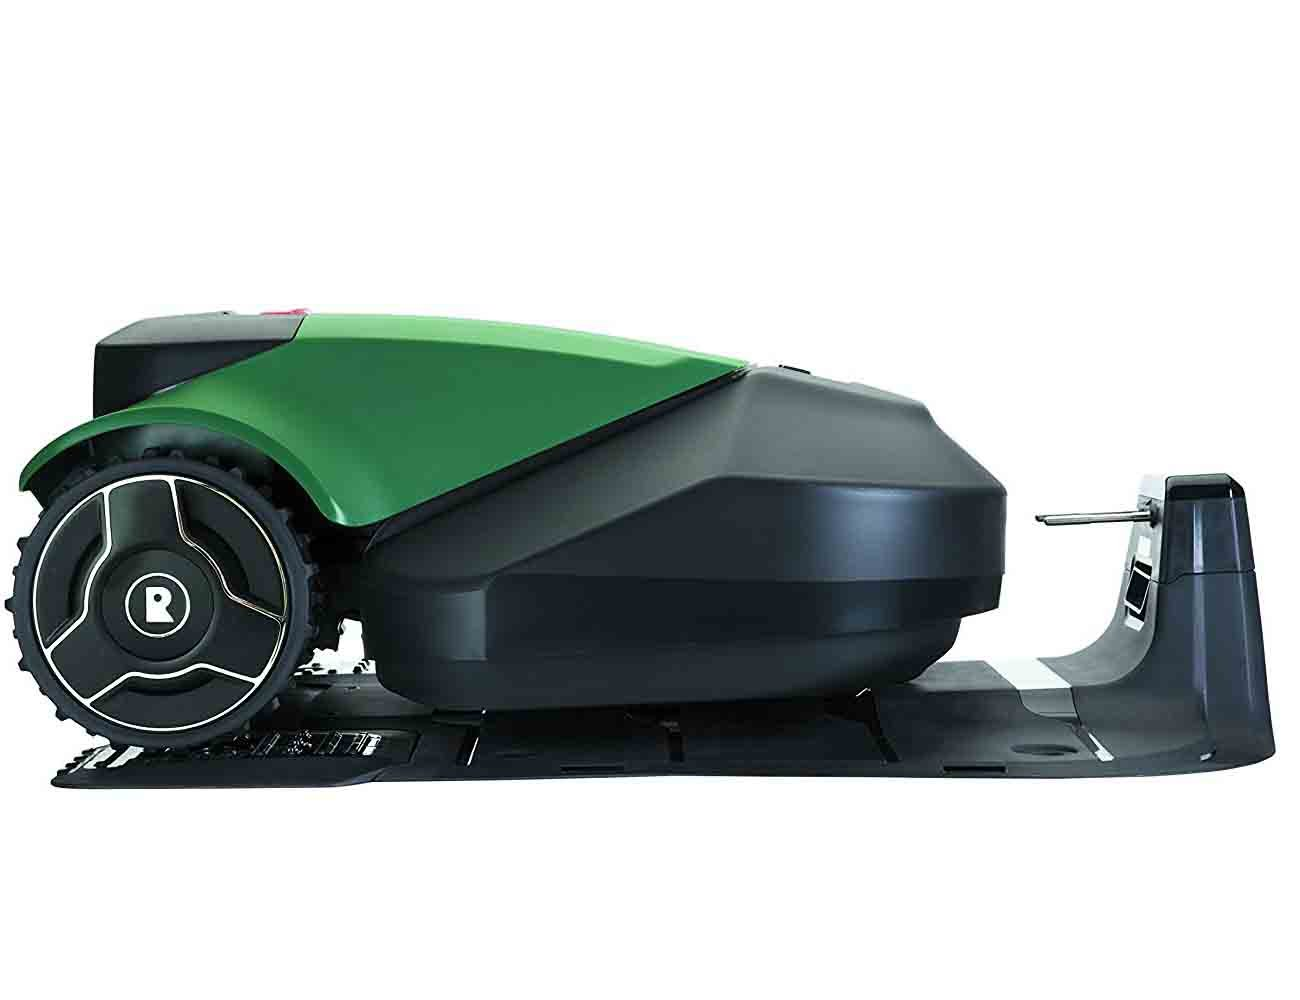 Robomow RS630 robotic lawnmower